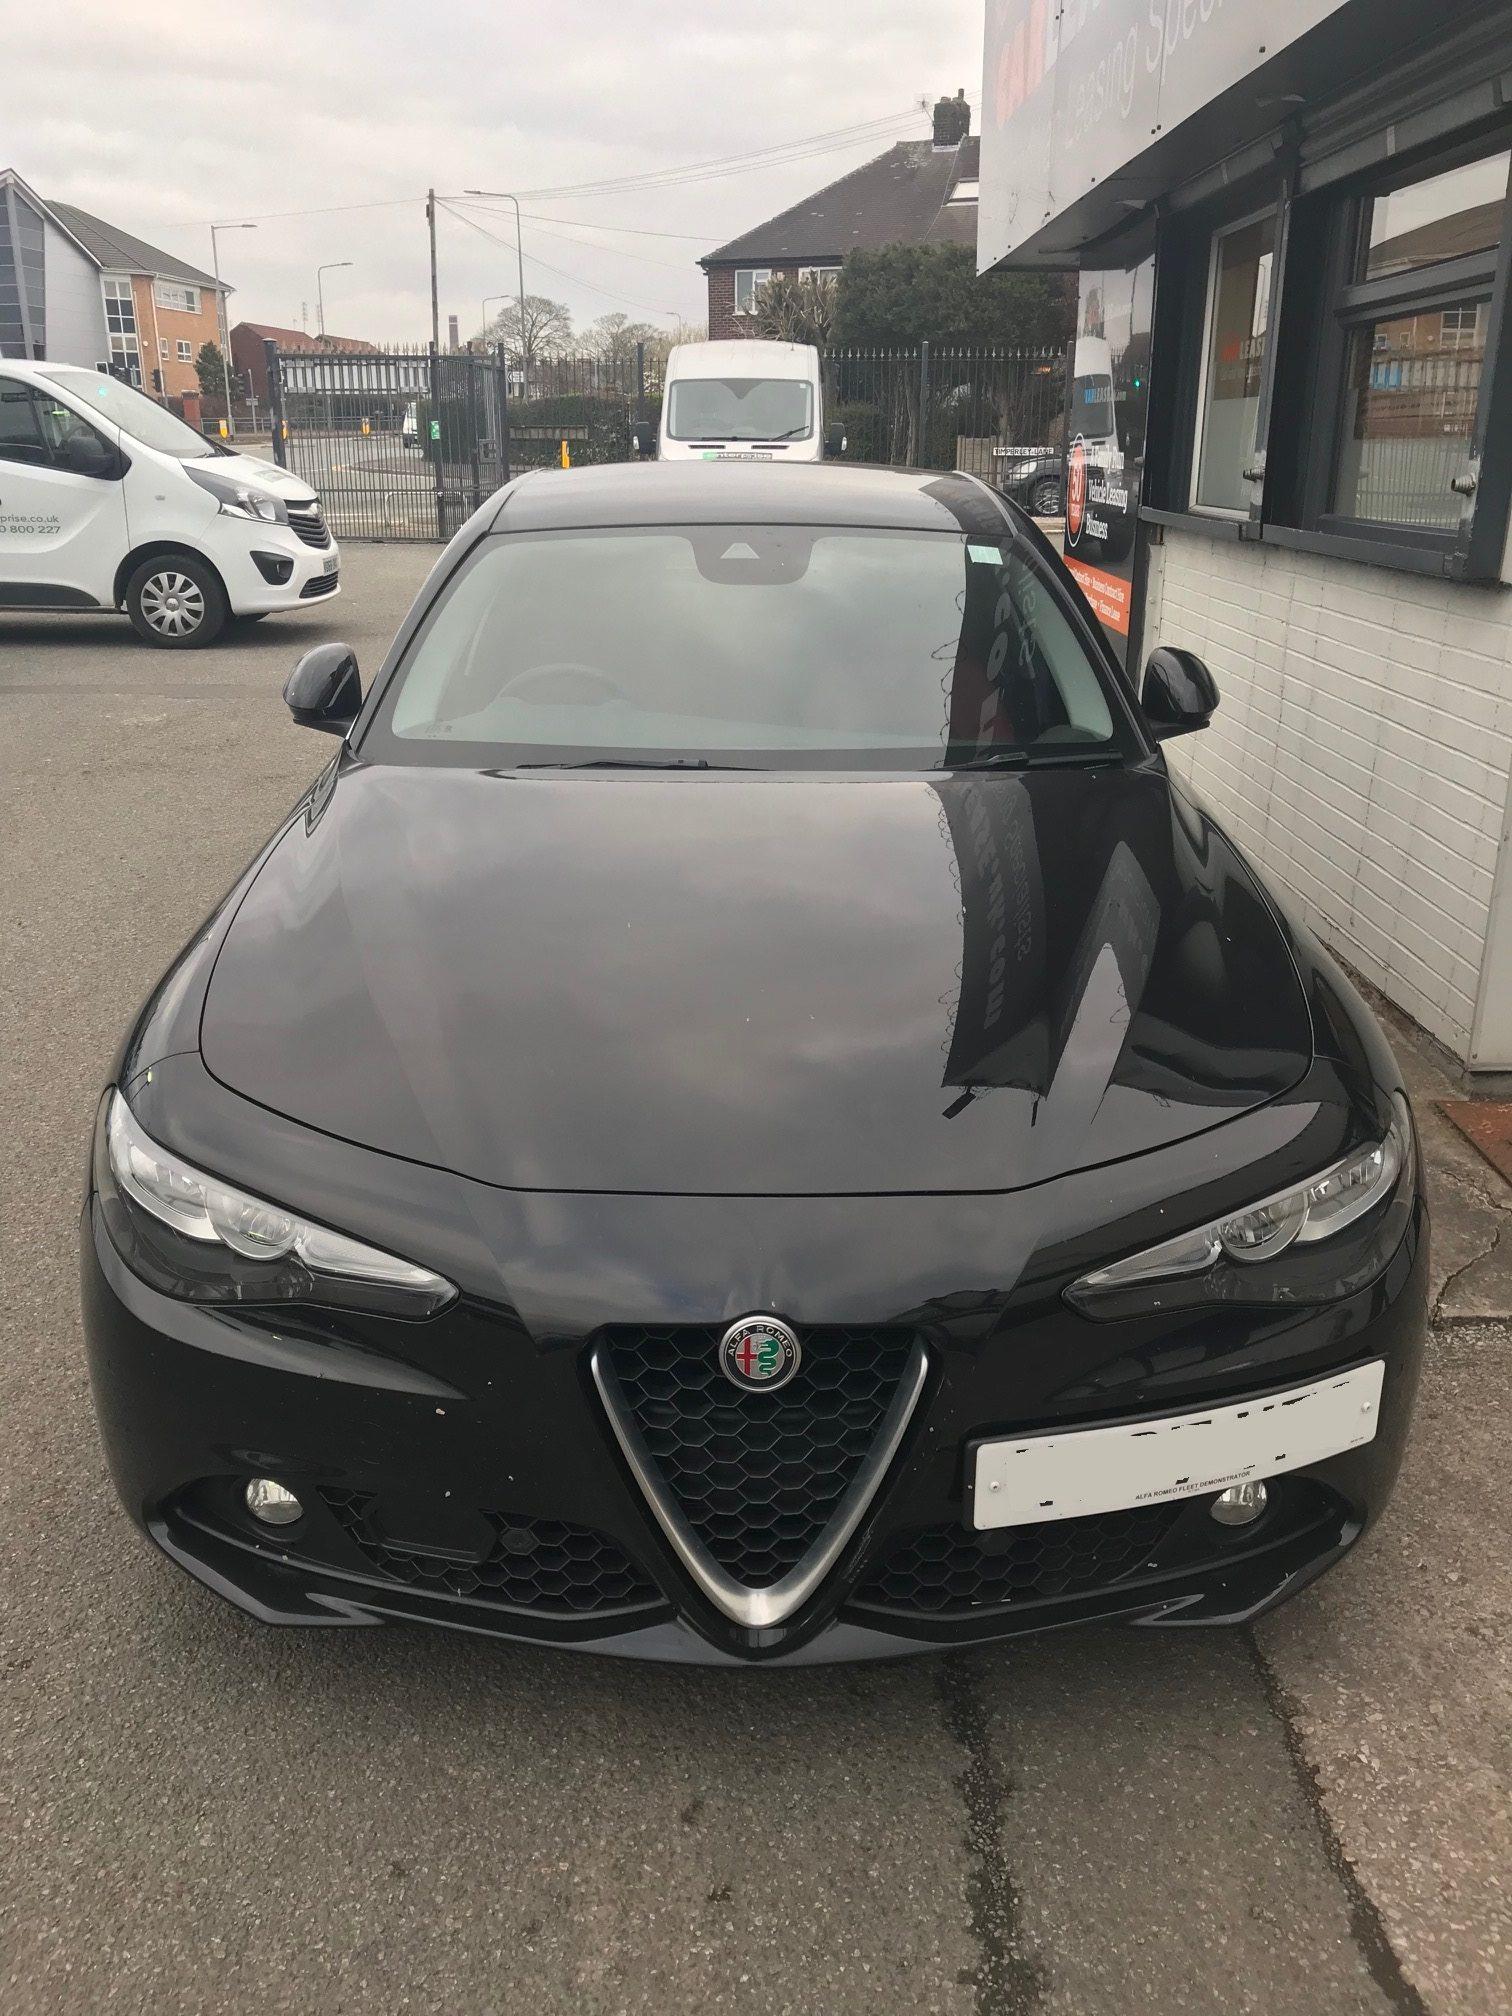 Alfa Romeo GIULIA DIESEL SALOON 2.2 JTDM-2 180 Tecnica 4dr Auto Car Leasing Best Offers